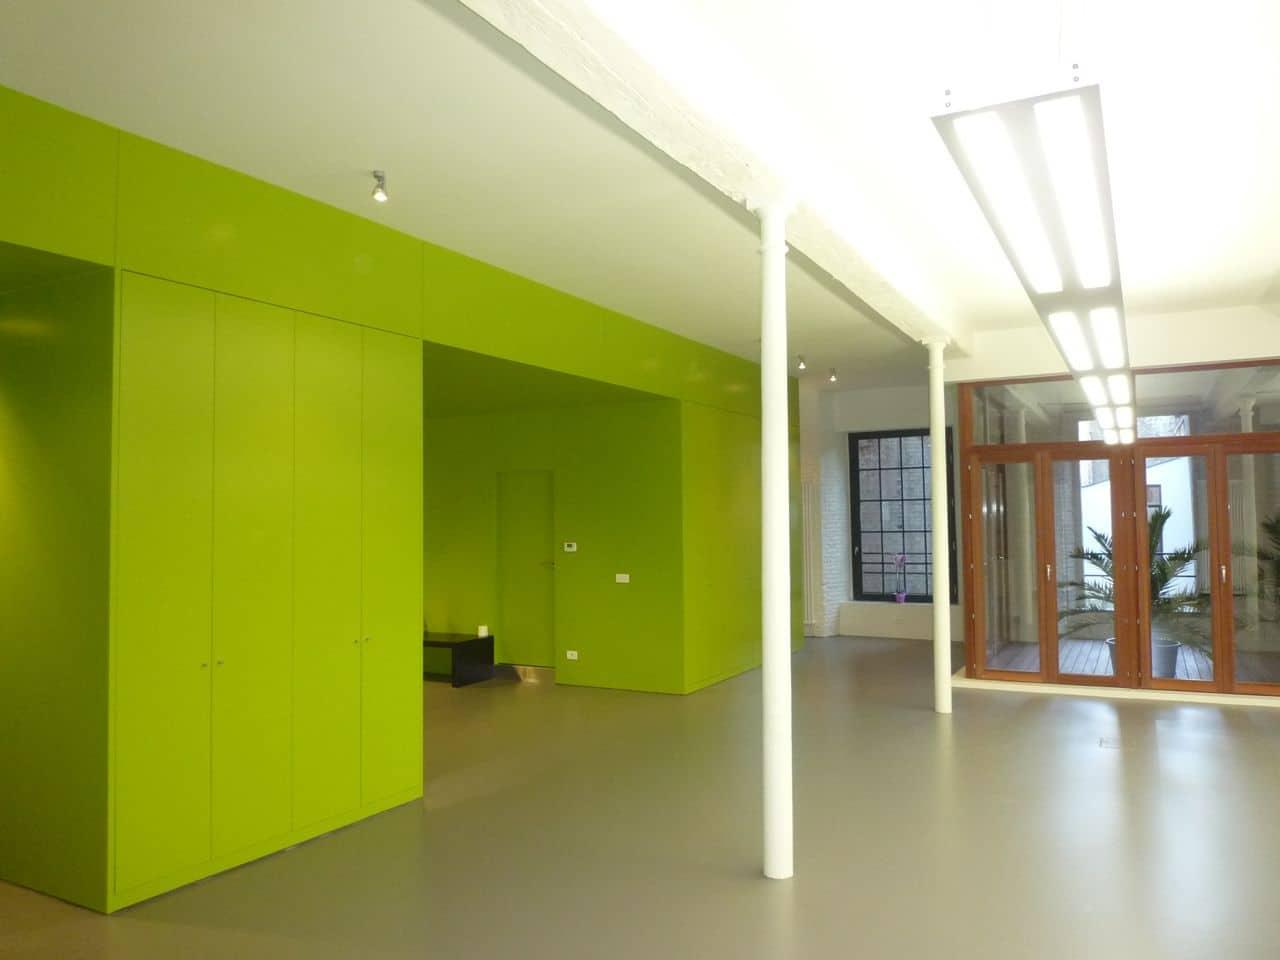 P1060770 | Baeyens & Beck architecten Gent | architect nieuwbouw renovatie interieur | high end | architectenbureau